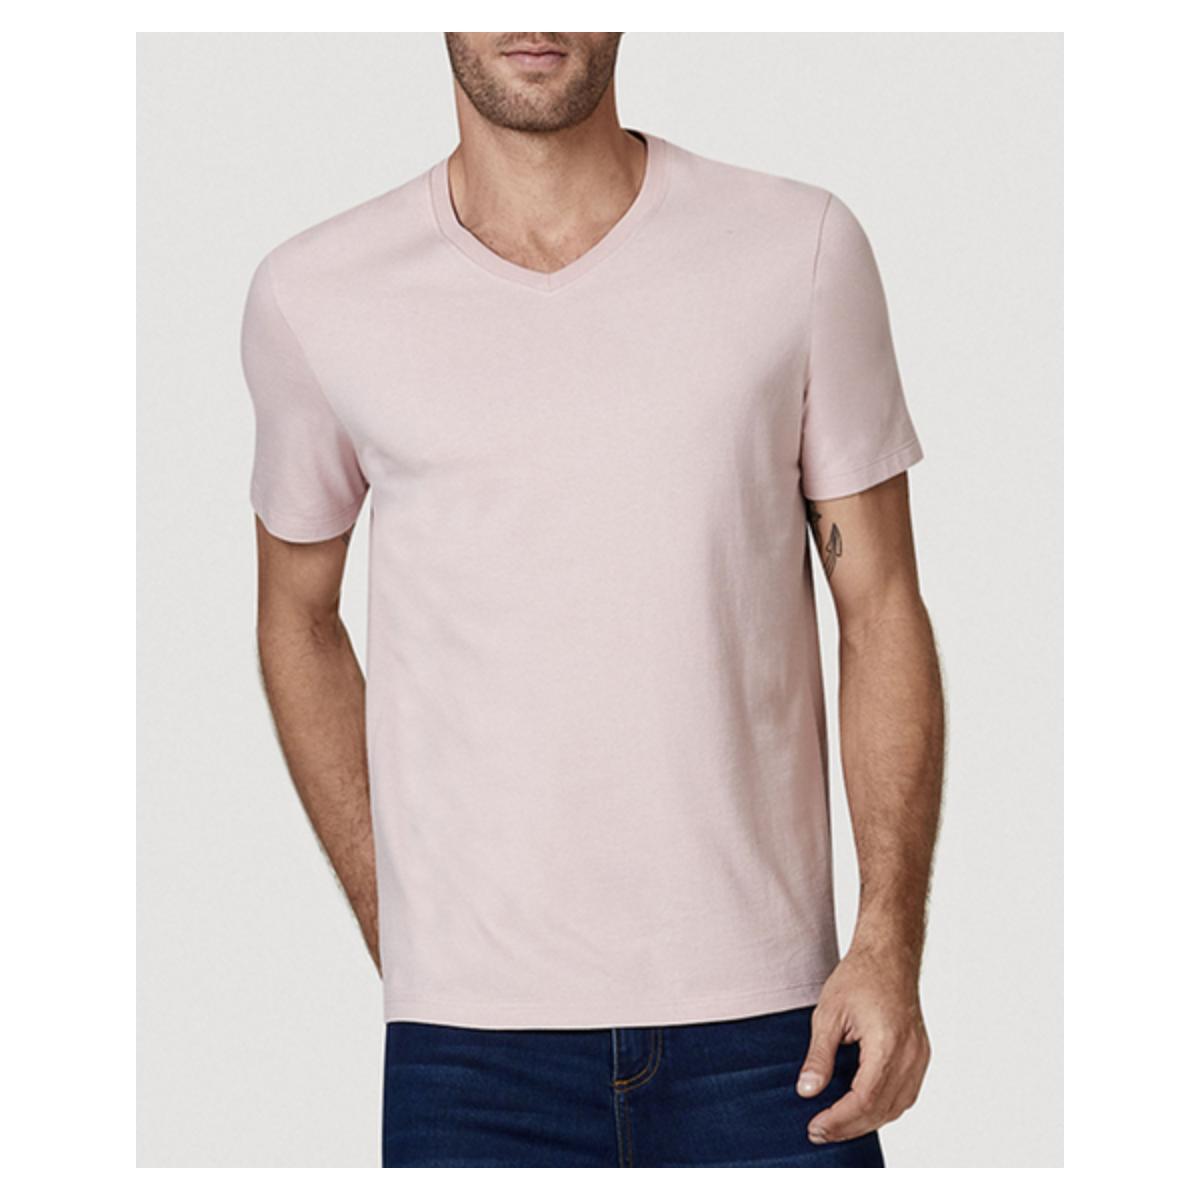 Camiseta Masculina Hering 022b Krqen Rosa Claro